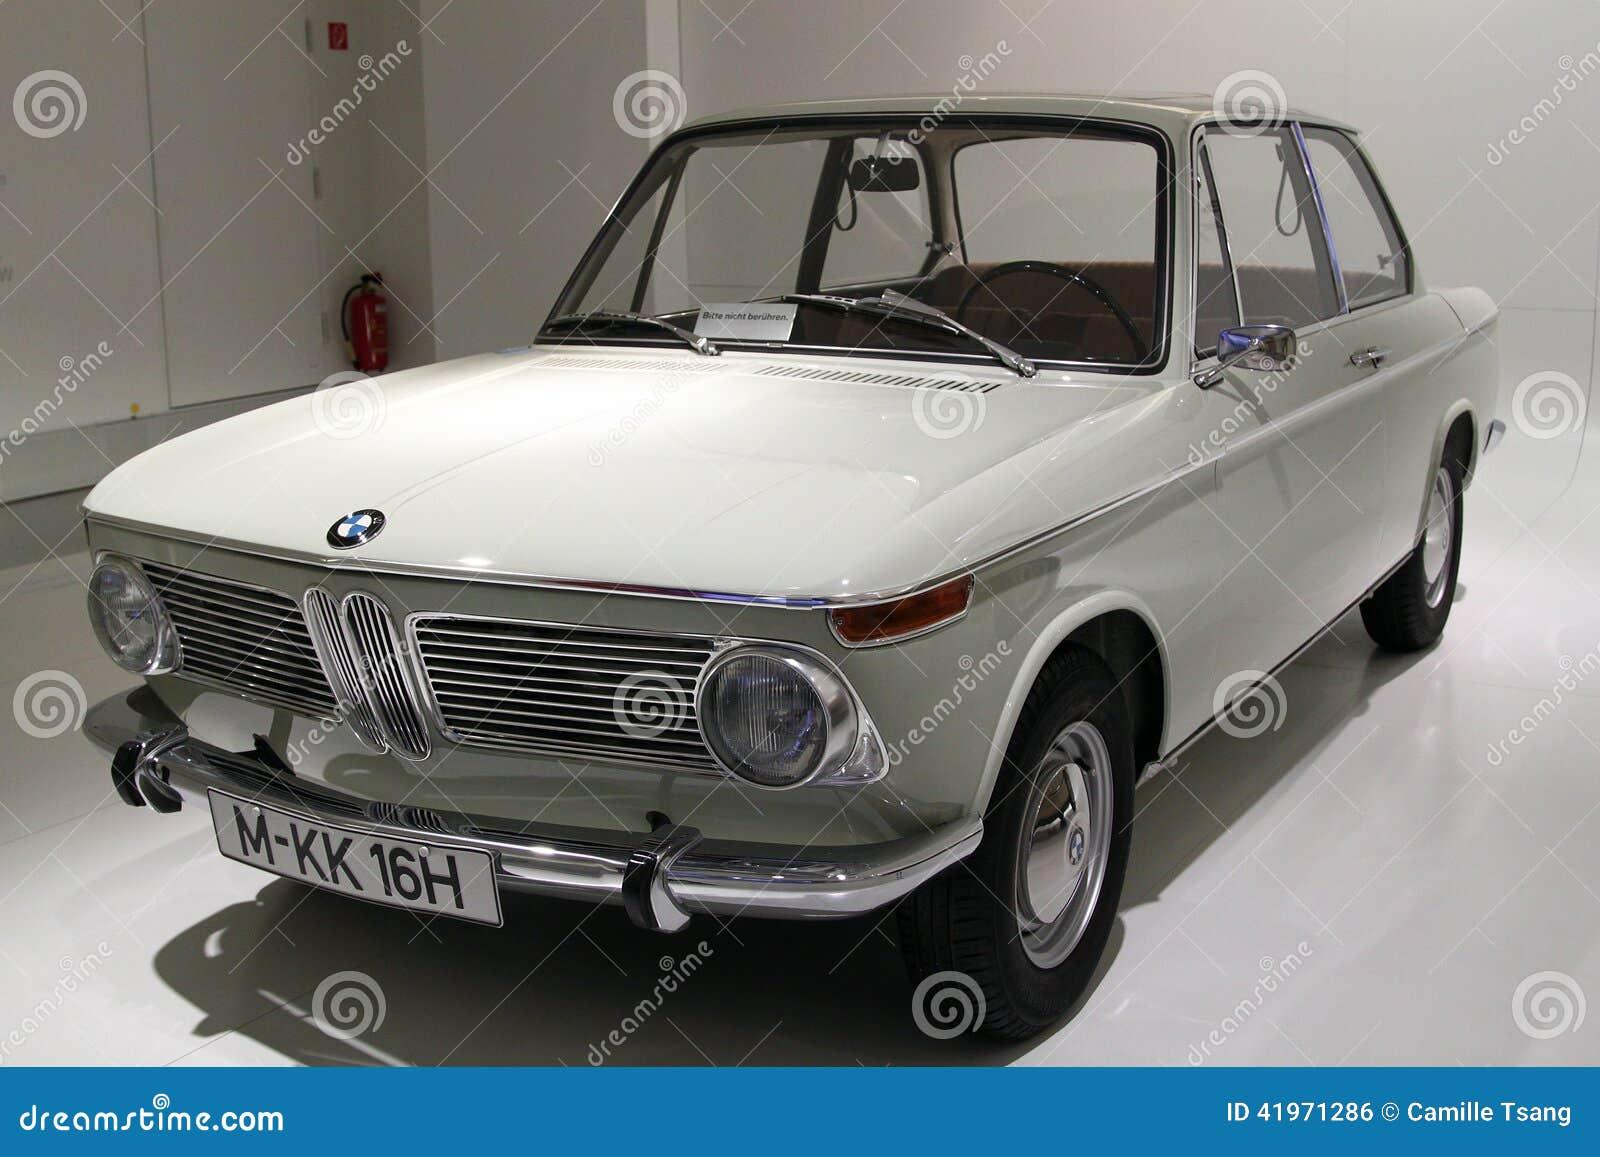 BMW 1600, BMW classic car